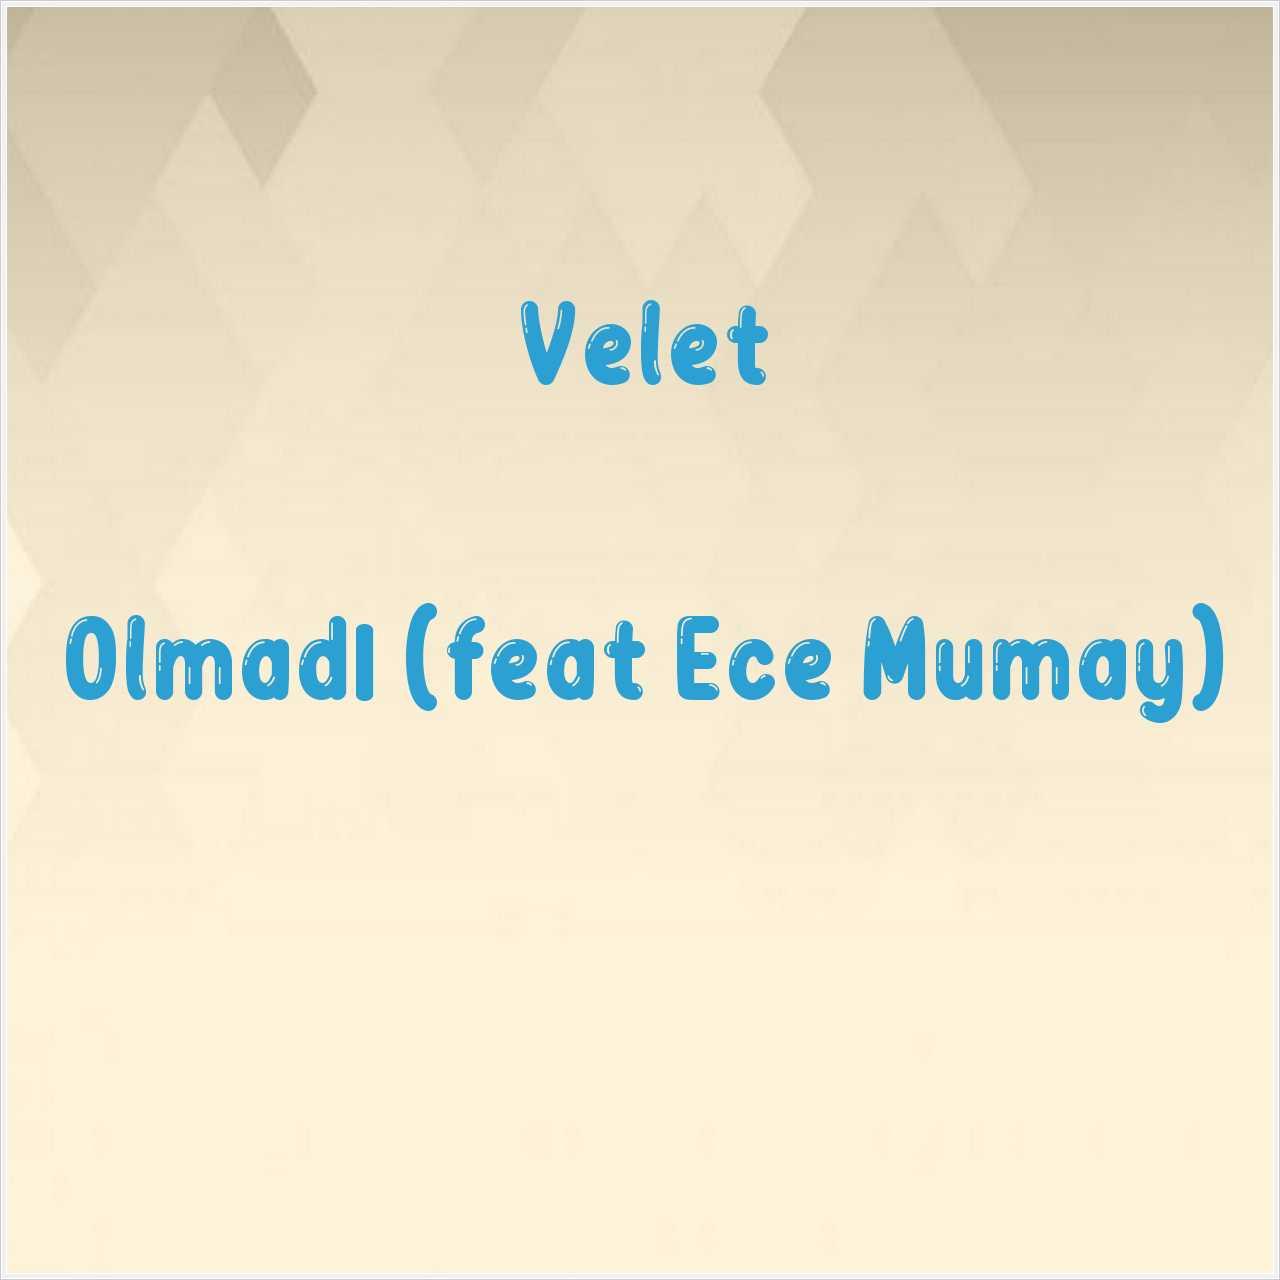 دانلود آهنگ جدید Velet به نام Olmadı (feat Ece Mumay)